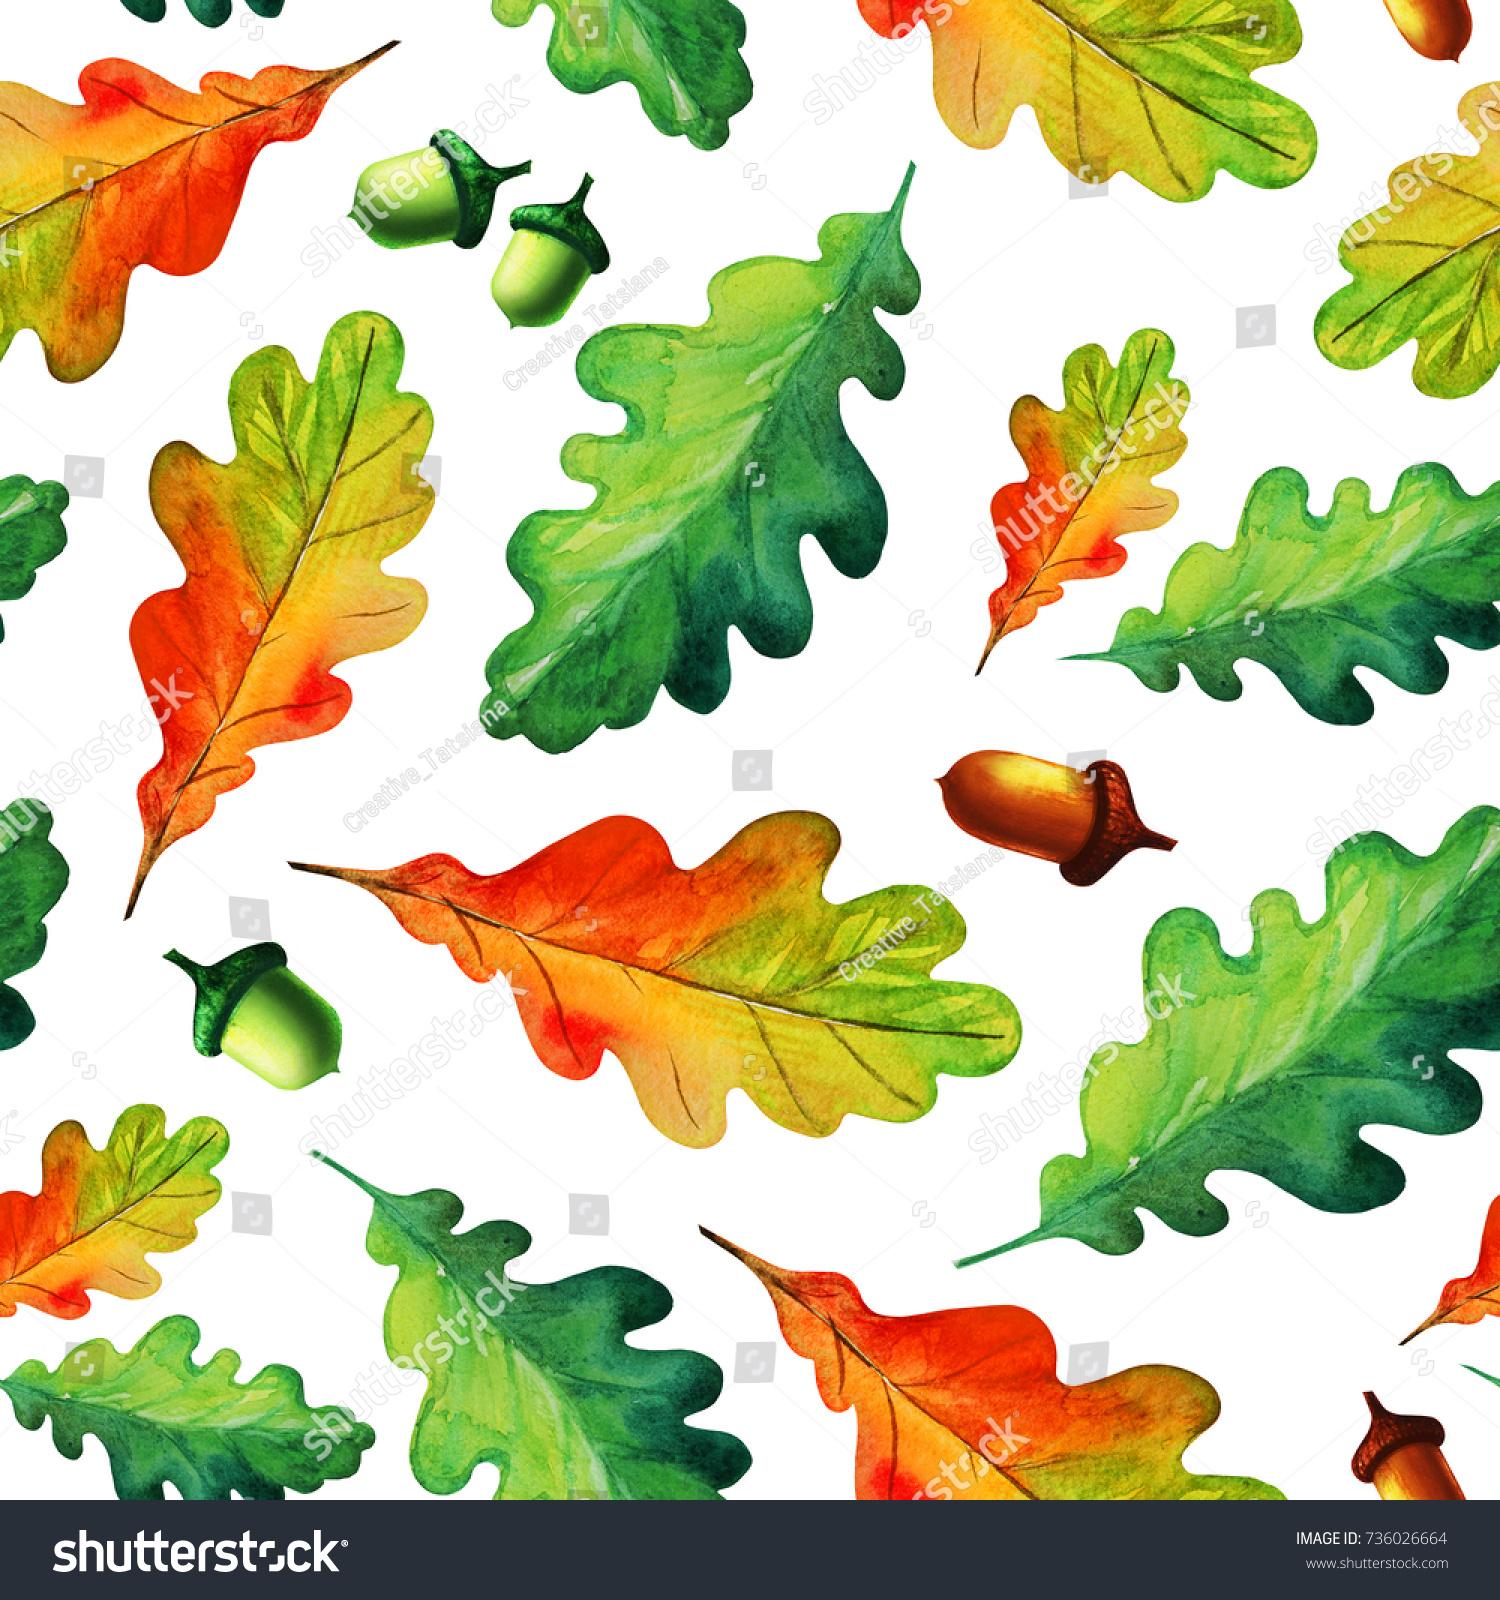 Colorful Watercolor Oak Tree Leaves Acorns Stock Illustration ...